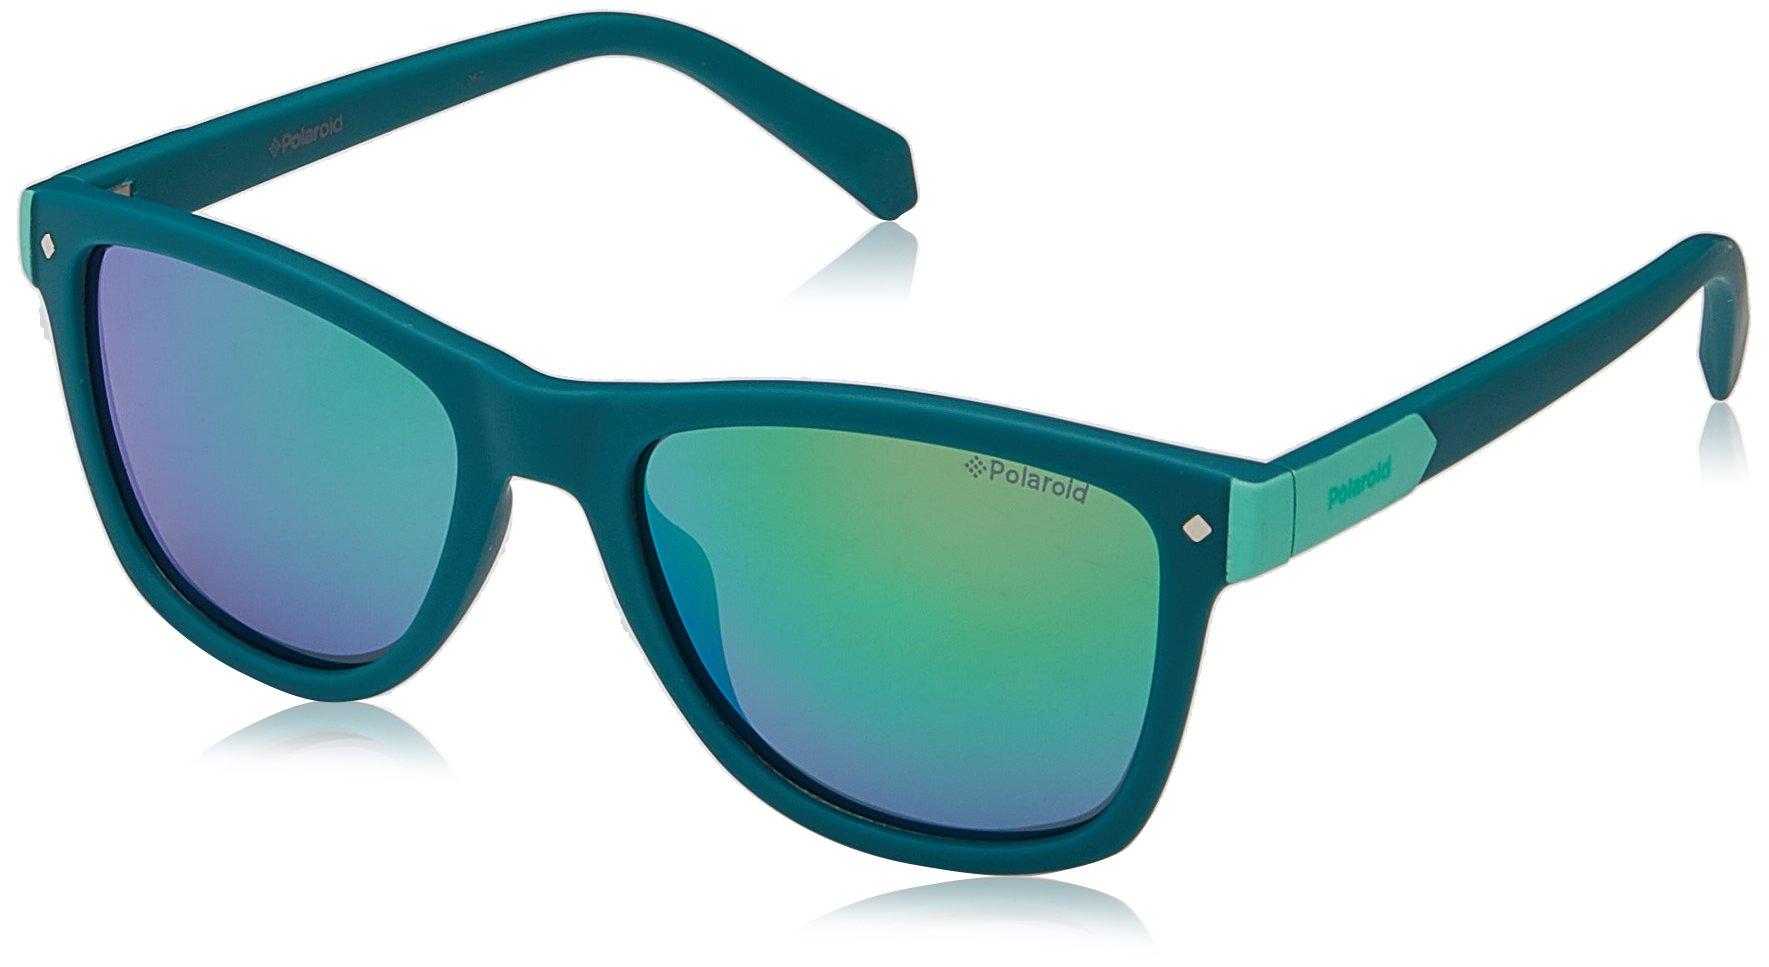 Polaroid Sunglasses Girls' Pld8025s Polarized Rectangular Sunglasses, Green, 48 mm